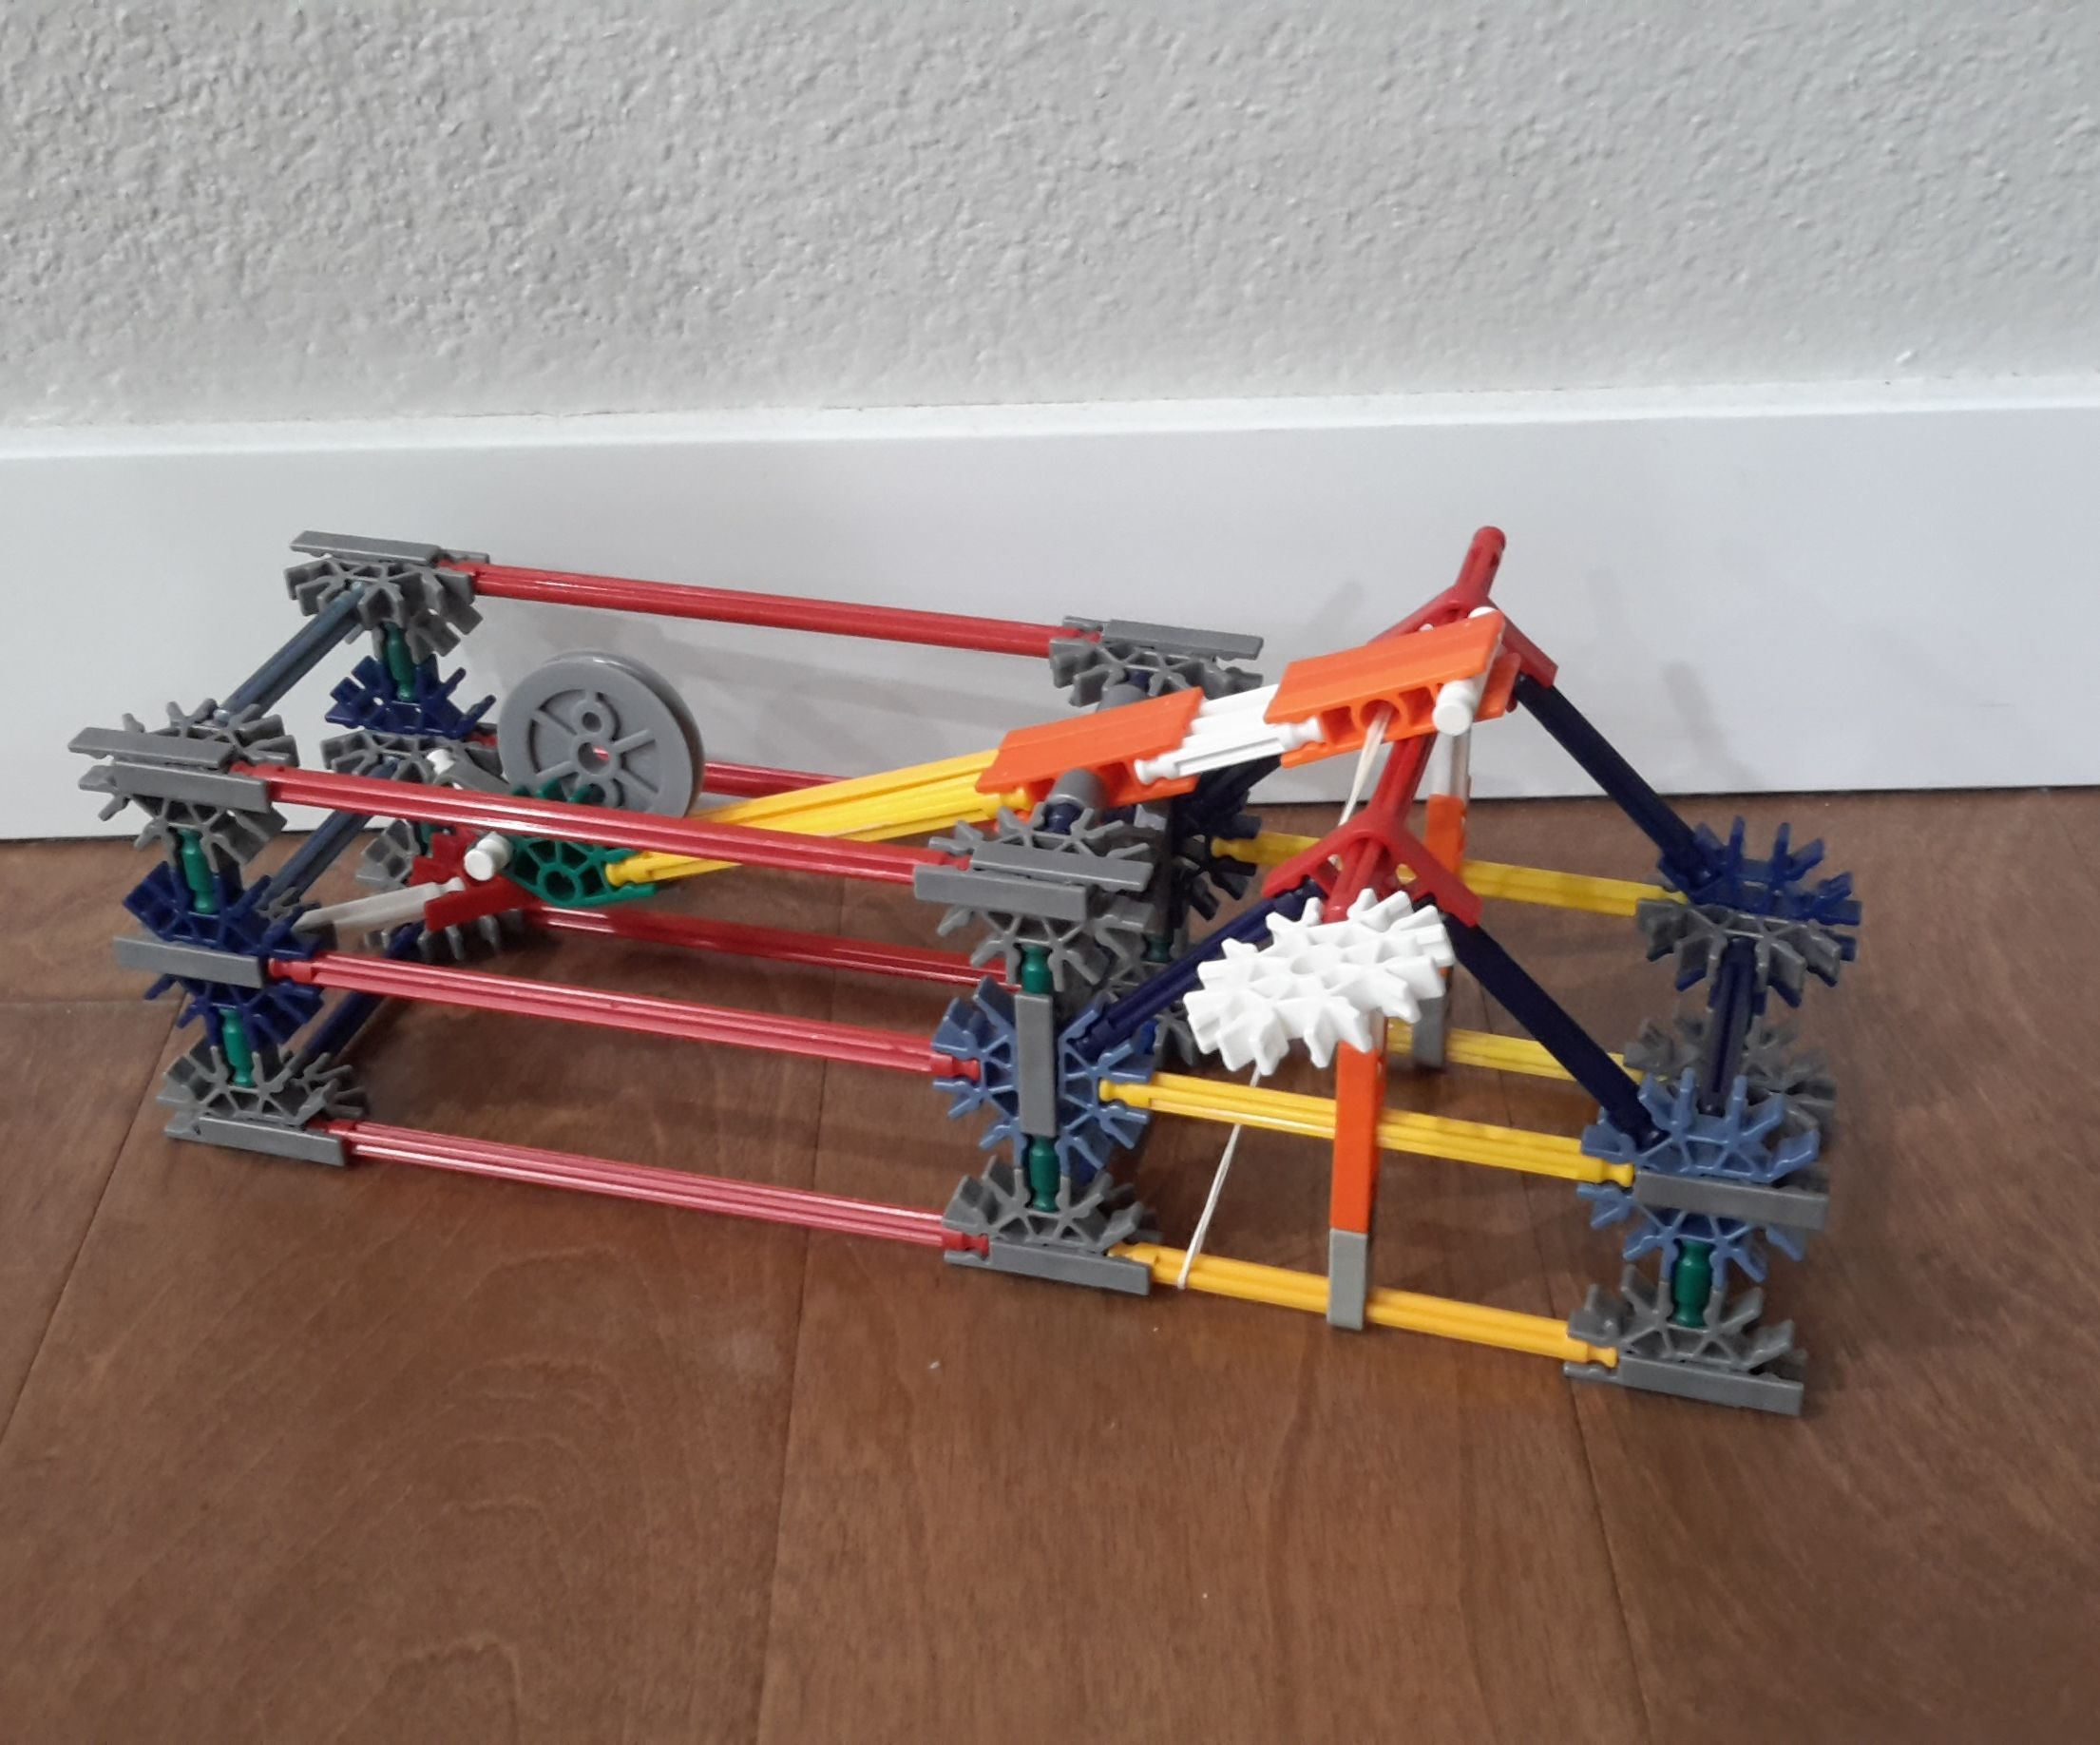 K'nex Catapult